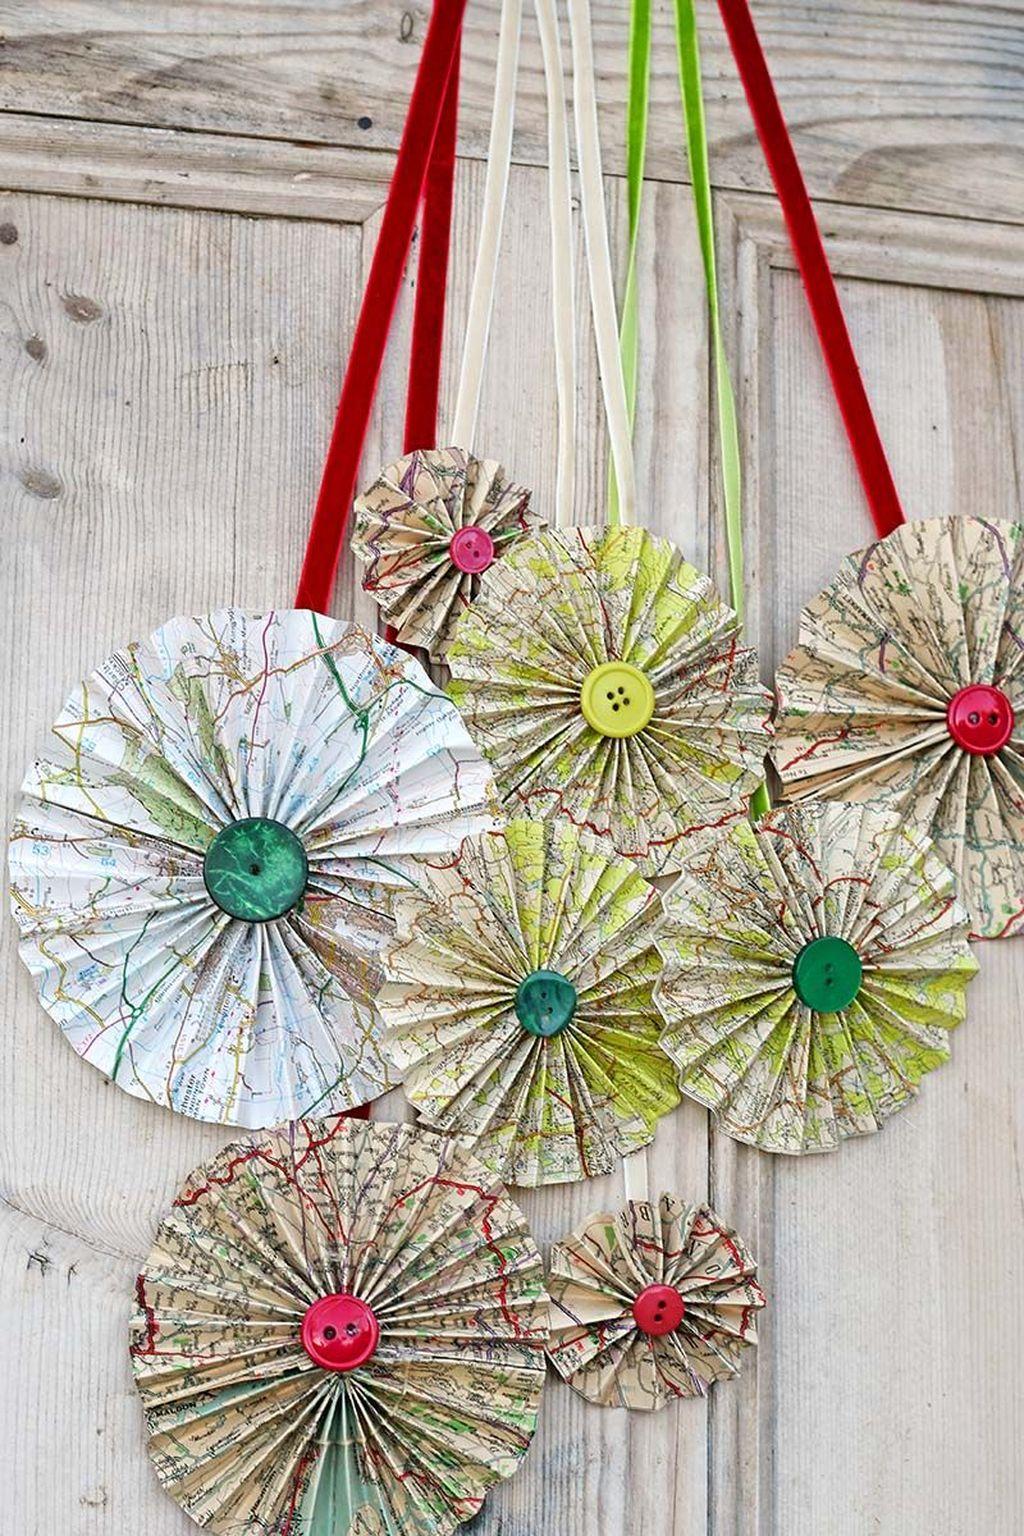 Creative Christmas Door Decoration Ideas To Inspire You 23